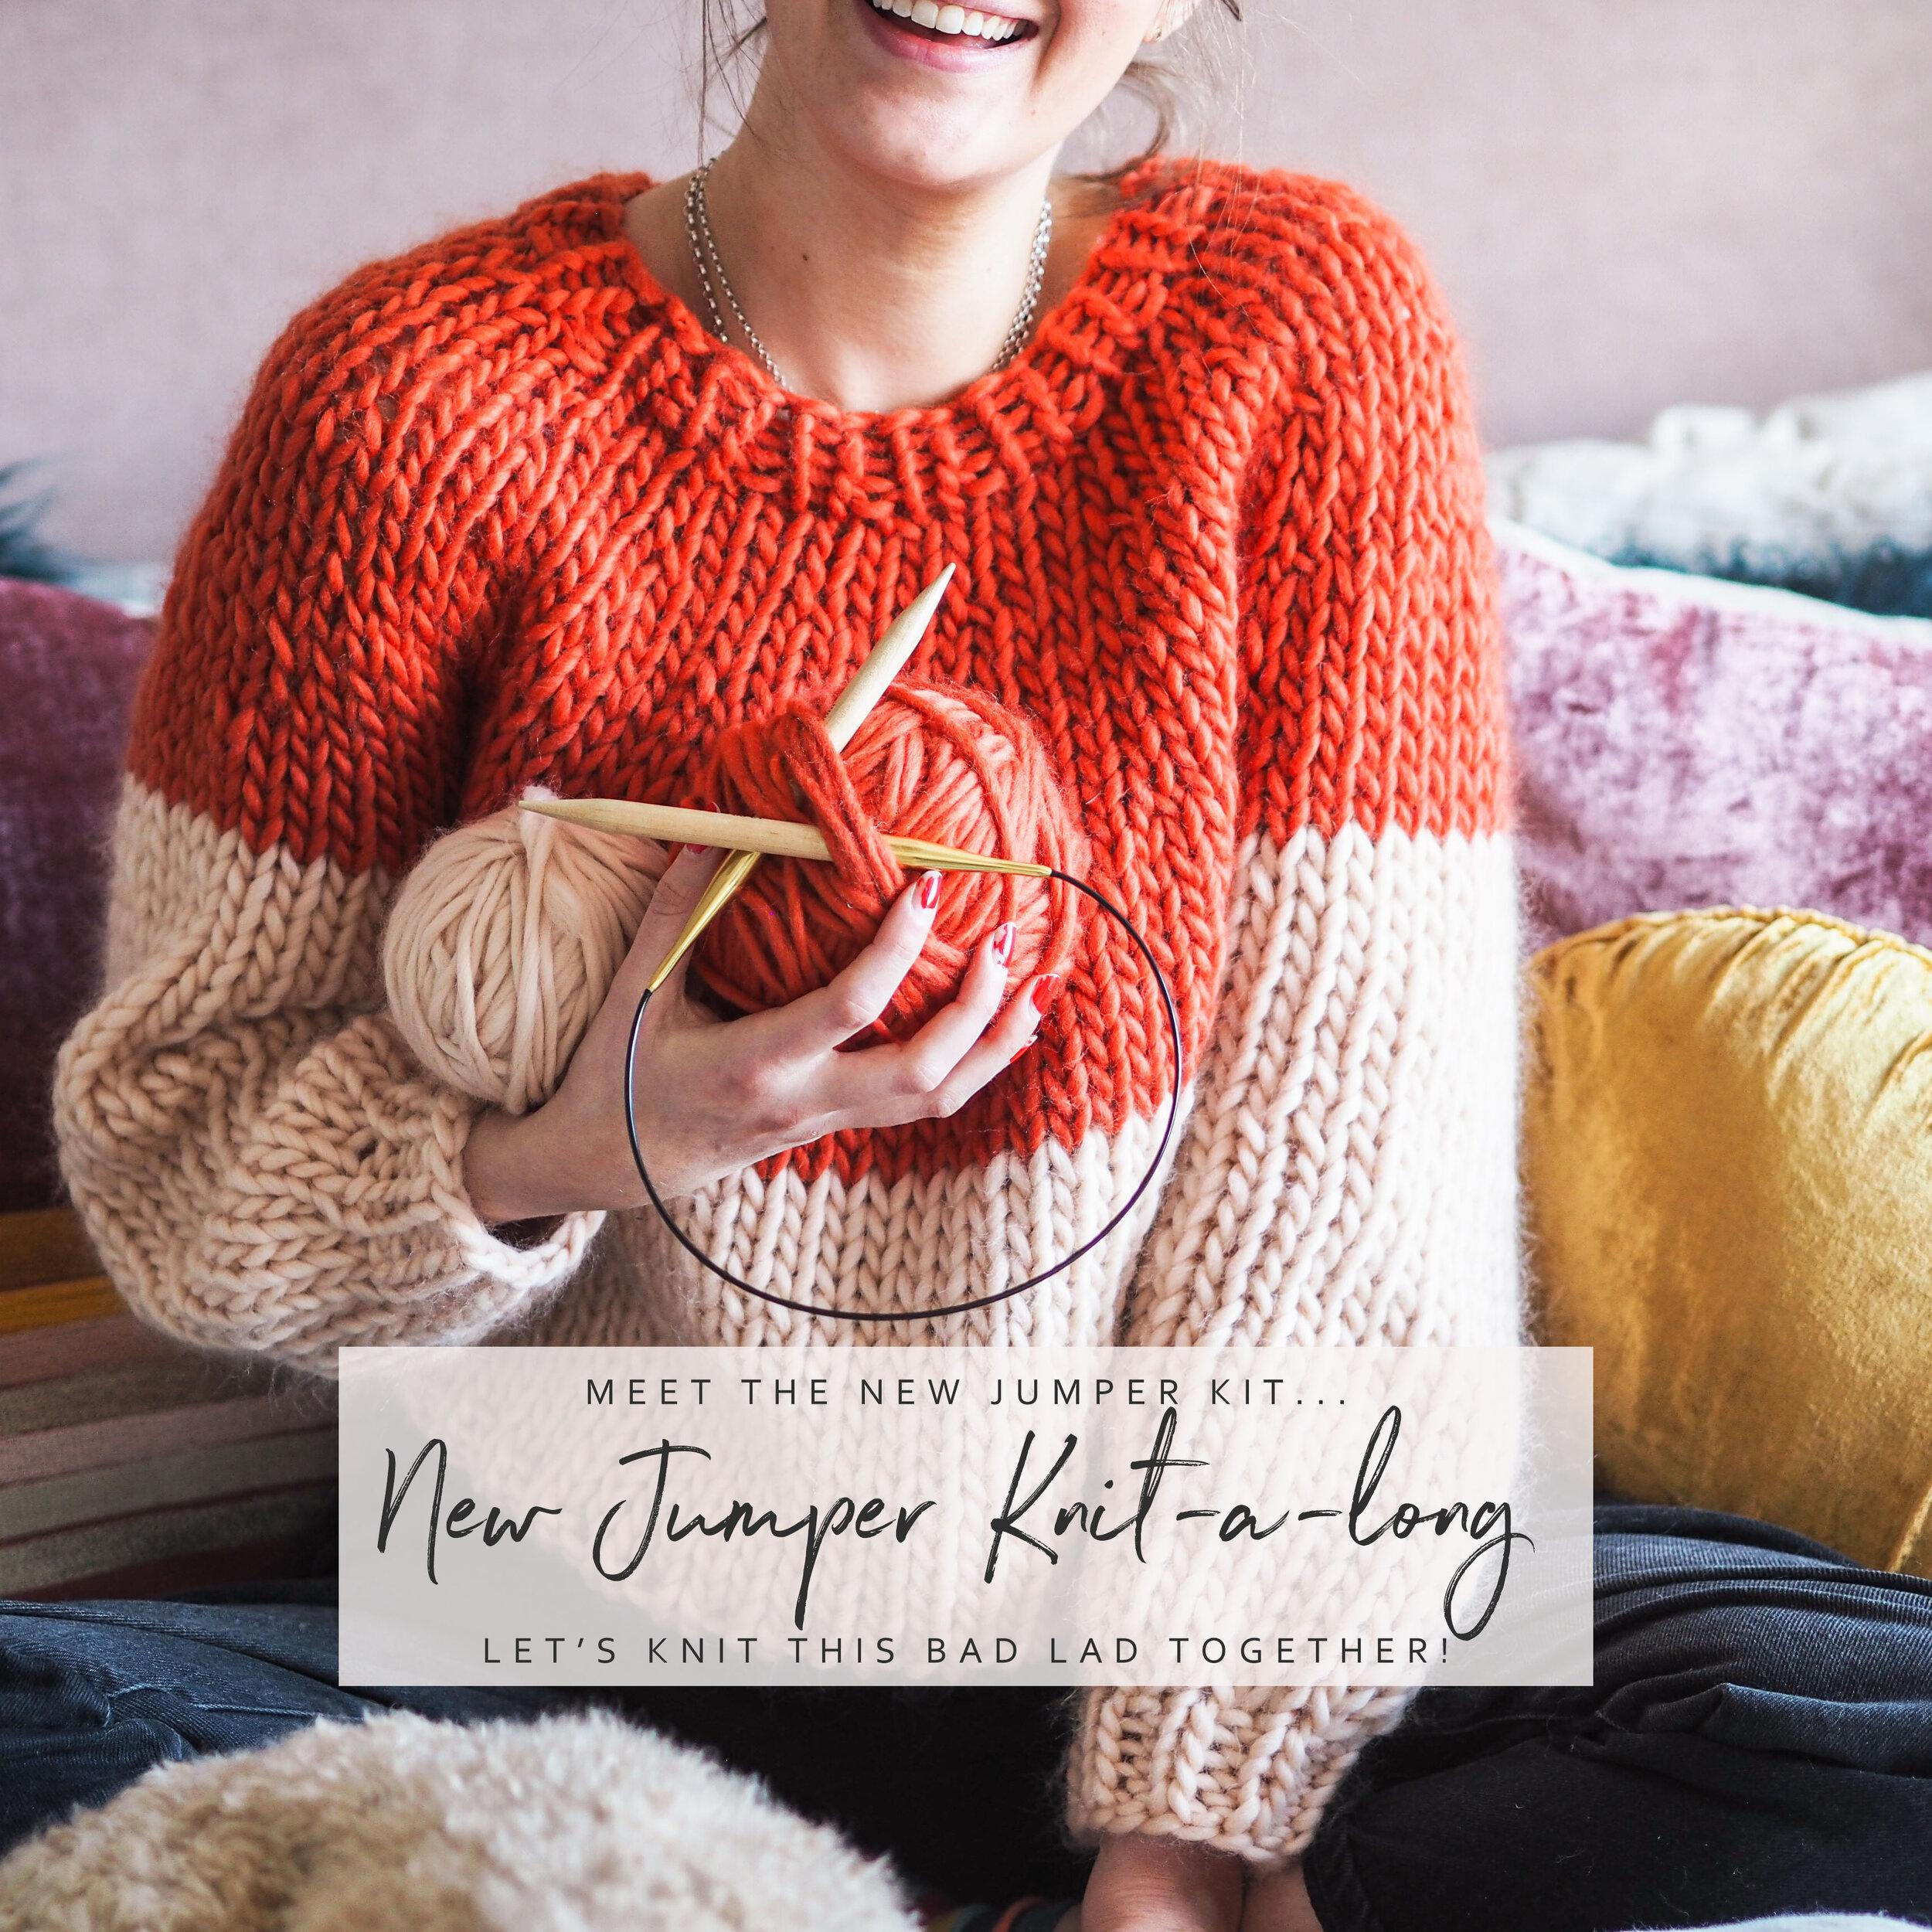 New jumper knit-a-long!